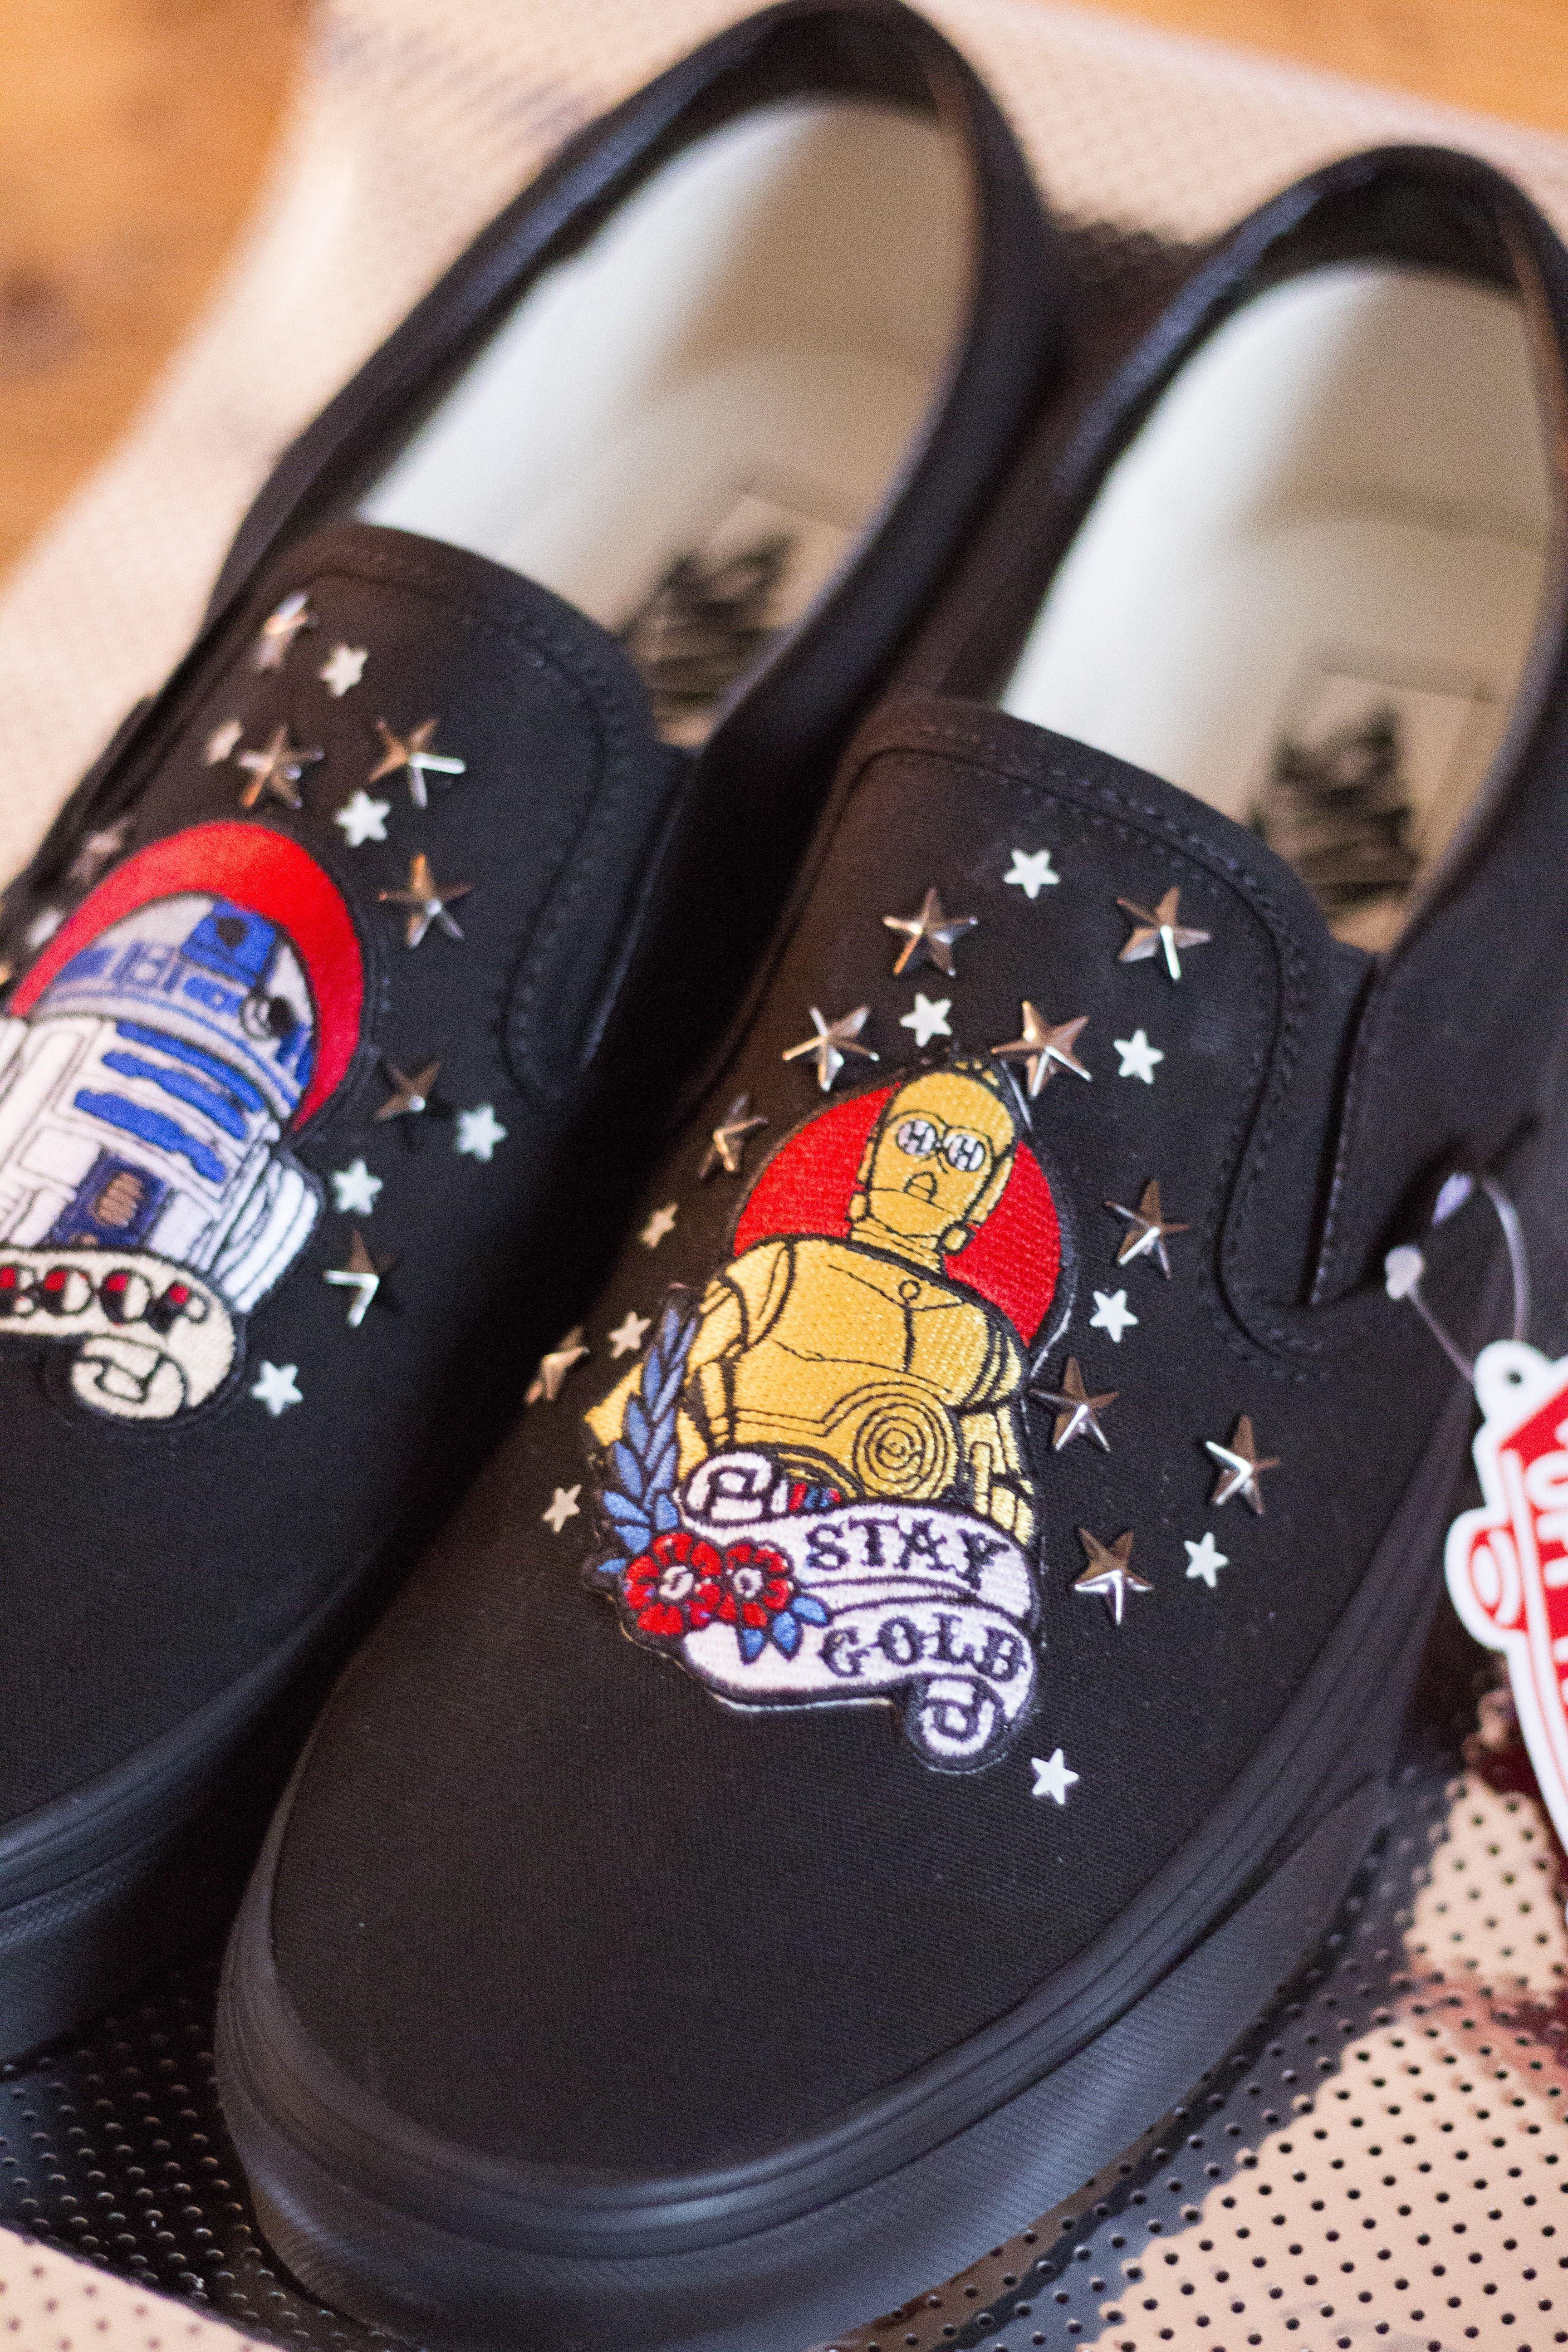 fd8e0fb1d9ad Droid Buddies Slip on bespoke custom Vans Trainers  Star wars shoes The   Droid